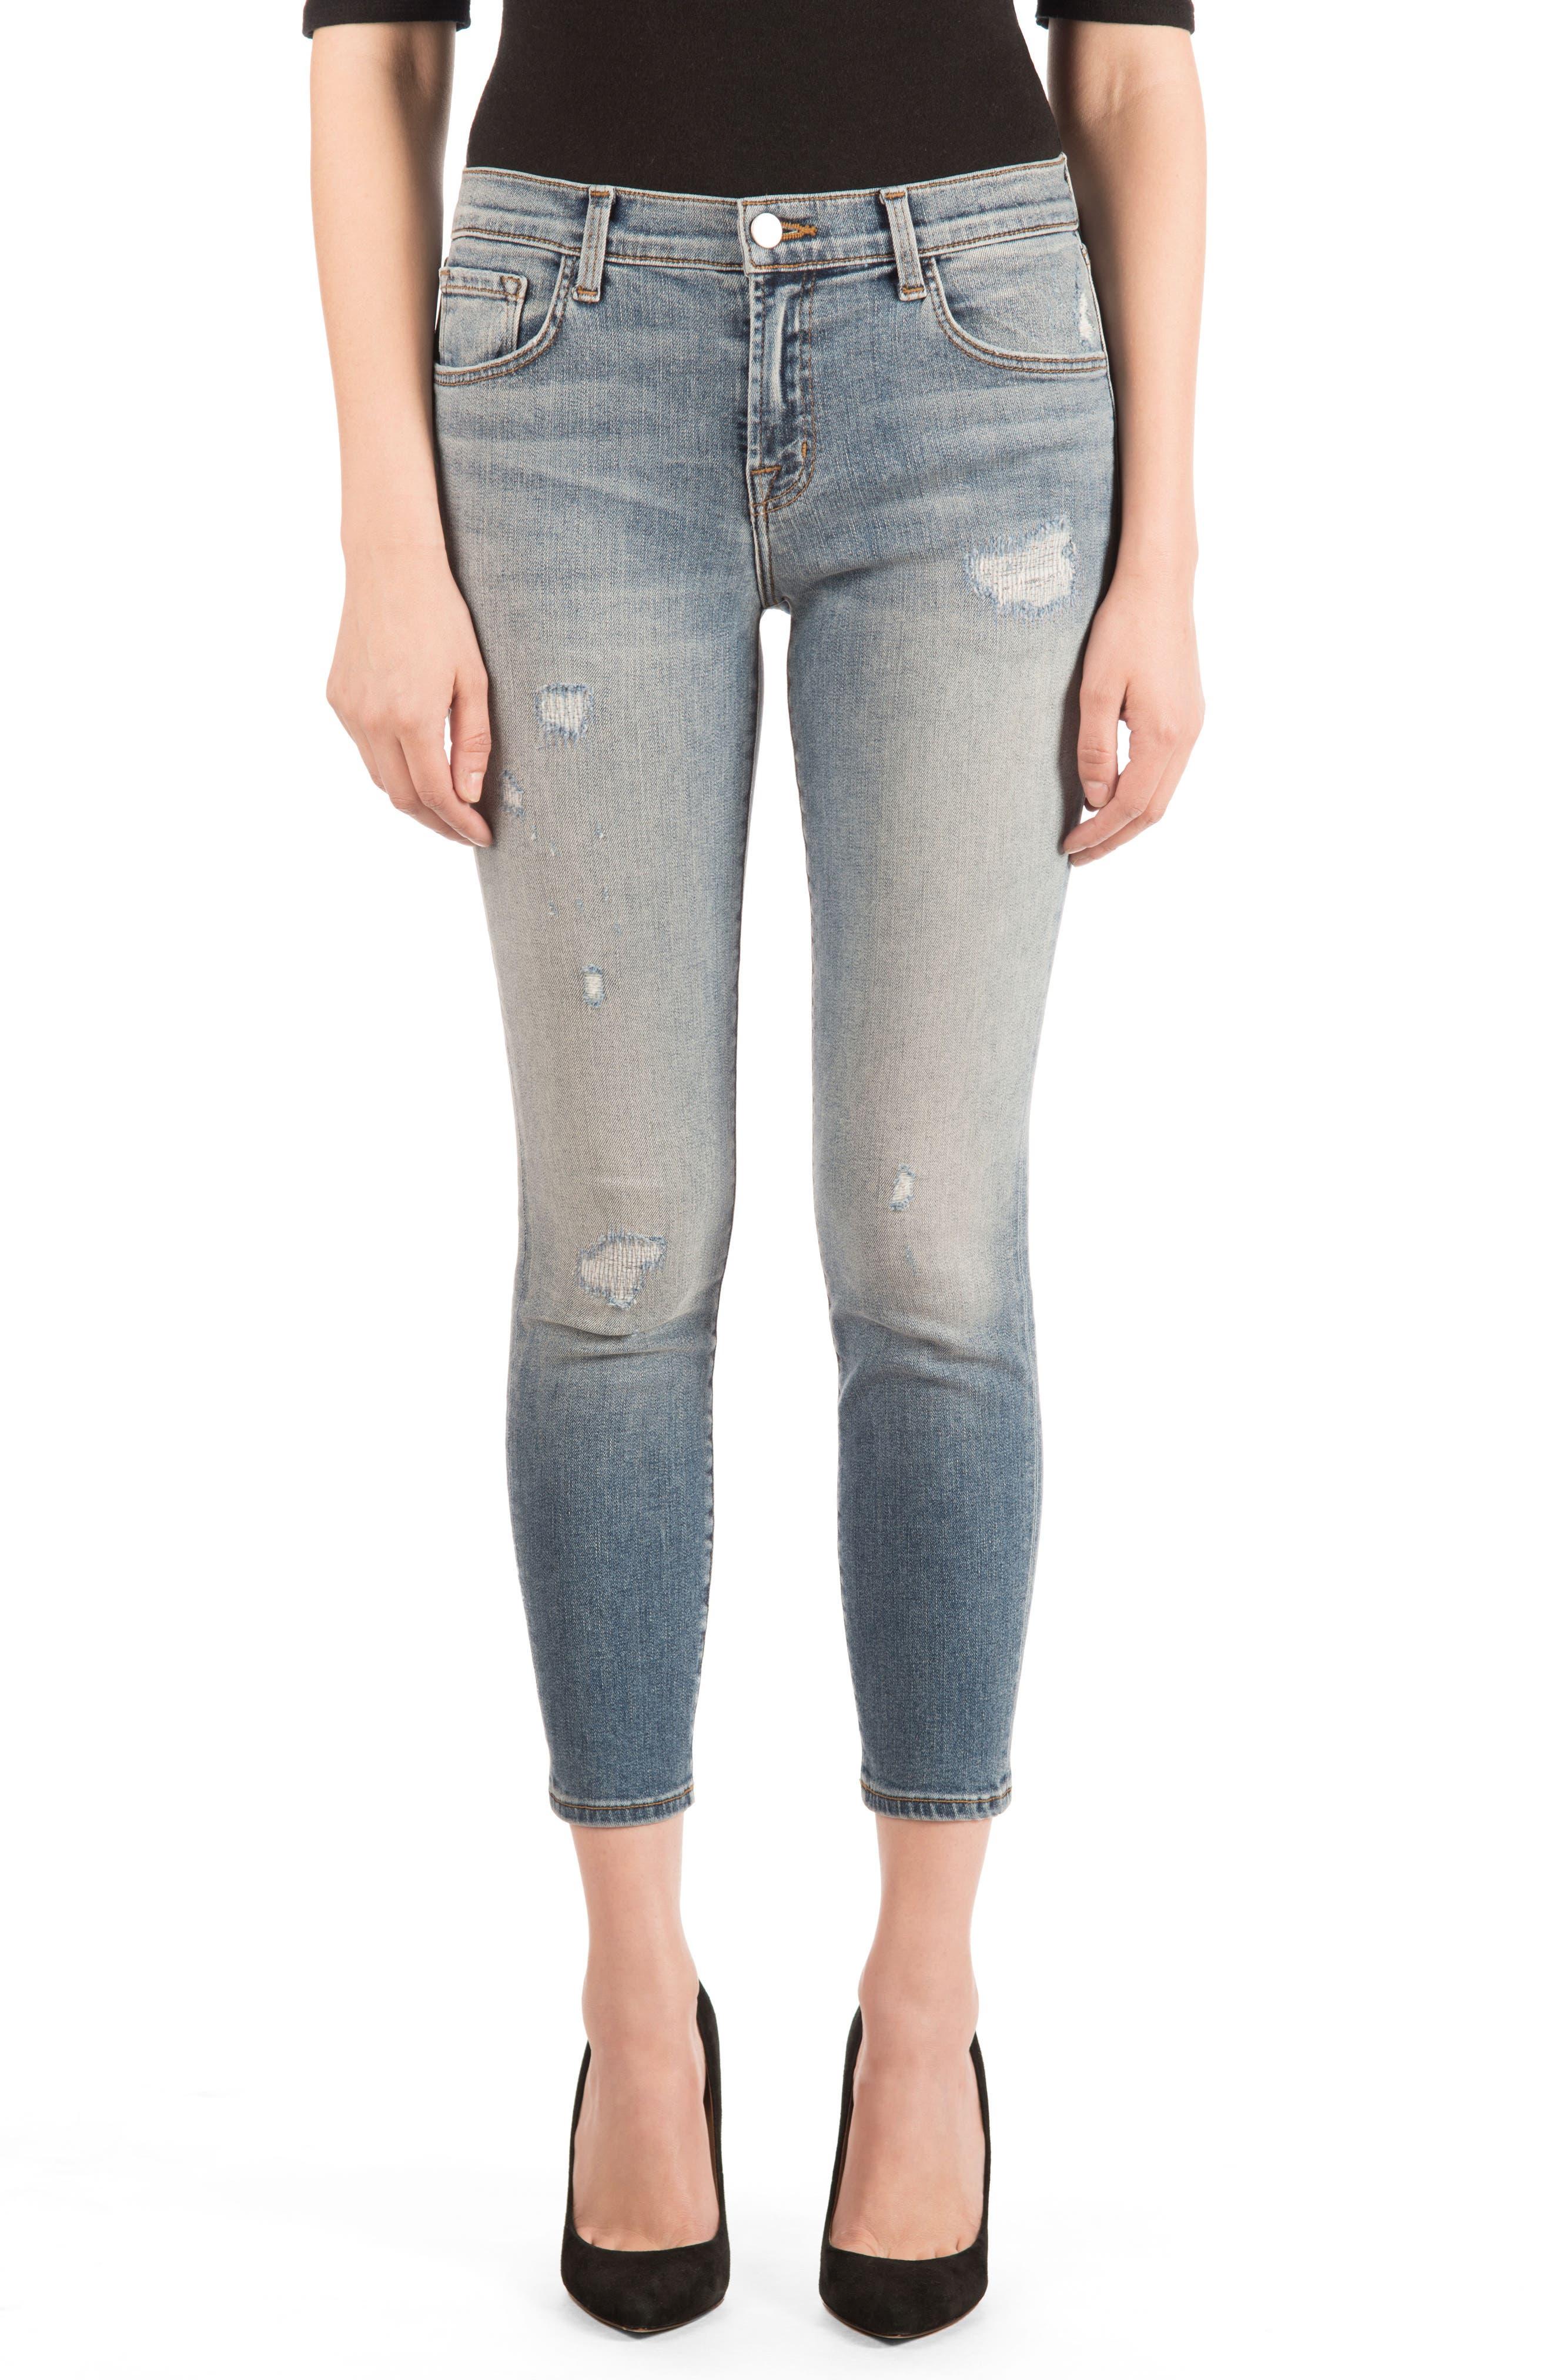 835 Distressed Capri Skinny Jeans,                             Main thumbnail 1, color,                             430